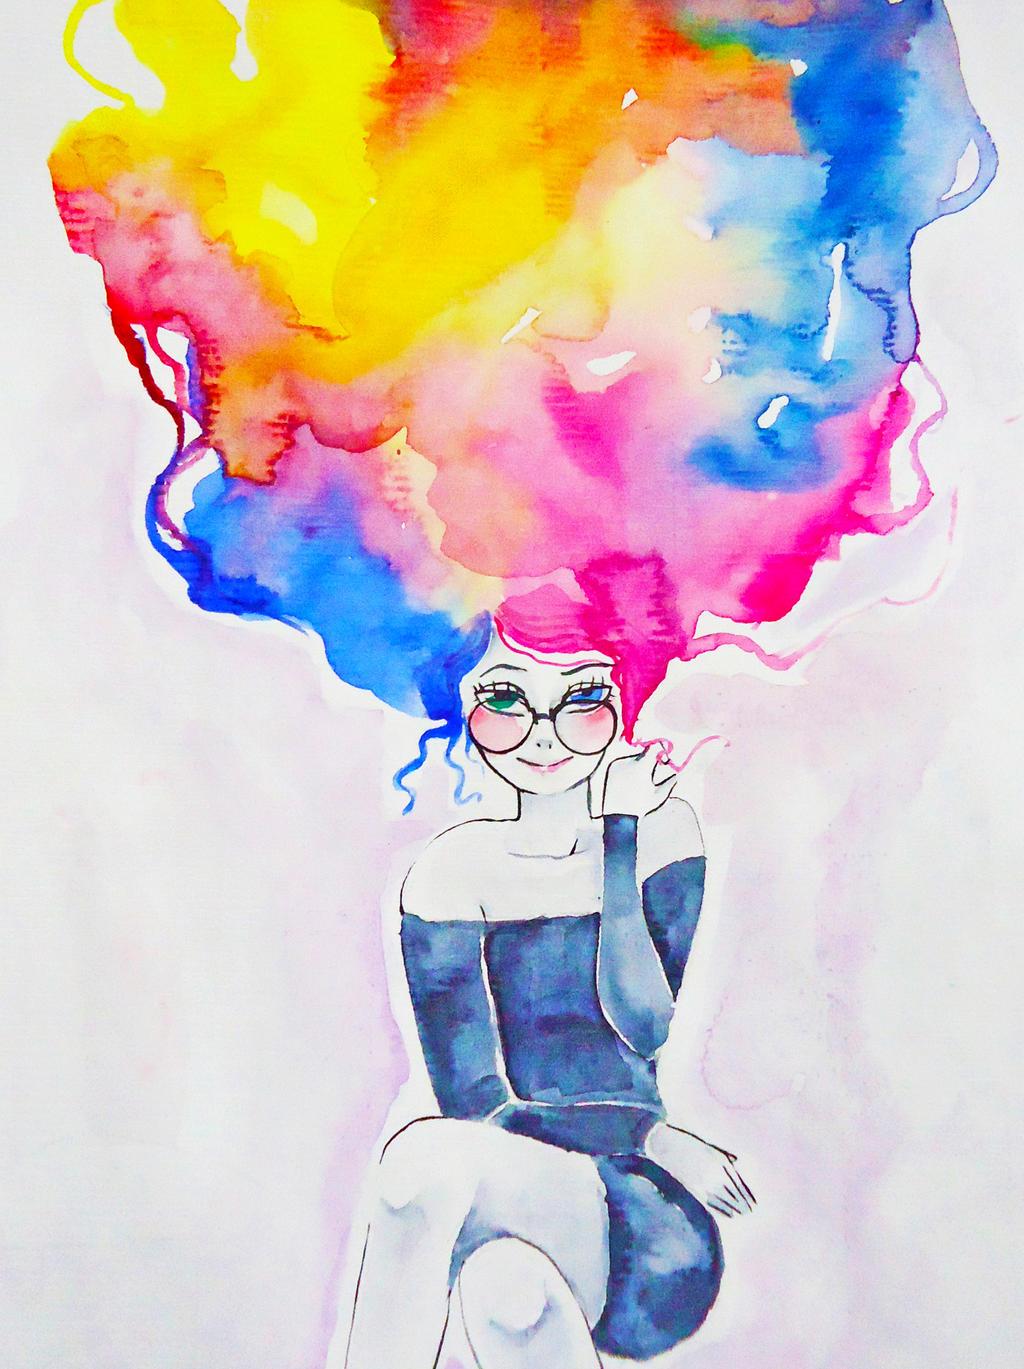 Hair Like Watercolour By Raposa7 On Deviantart